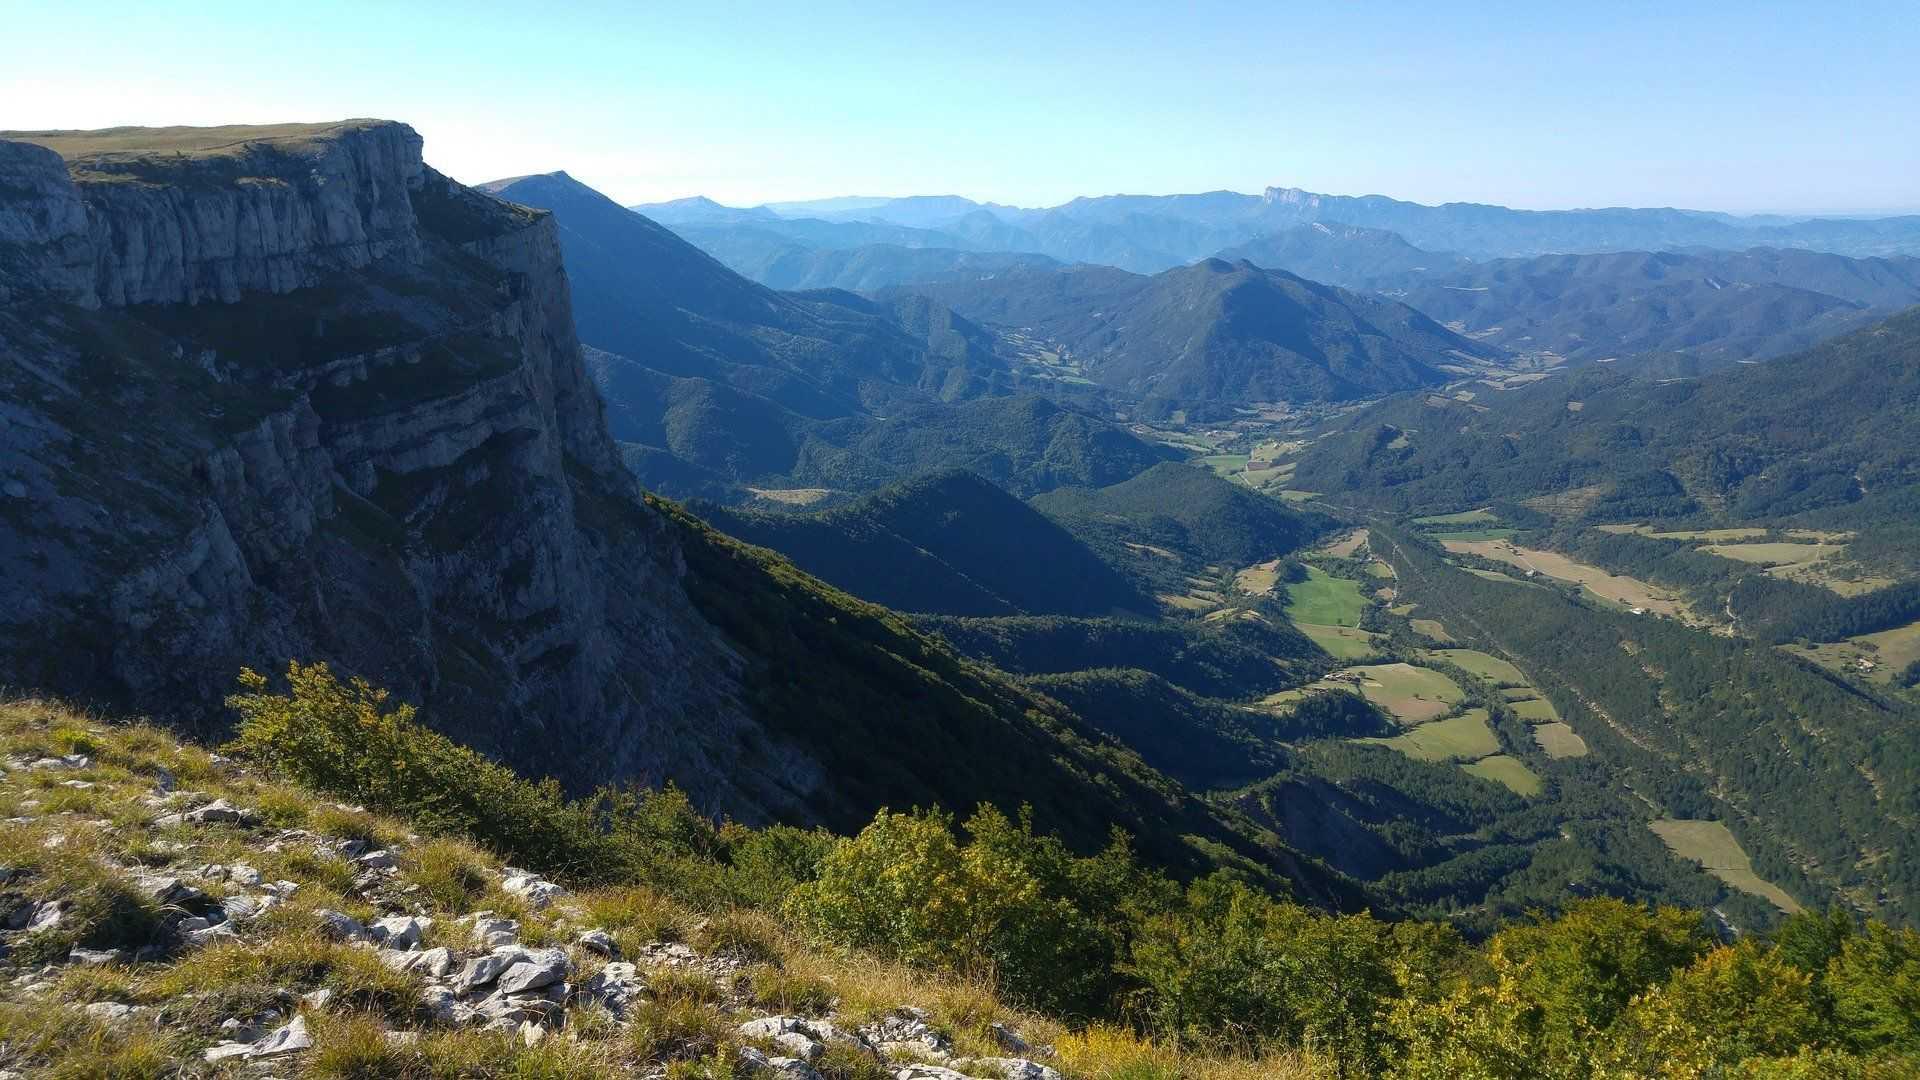 Vallée du massif du Vercors